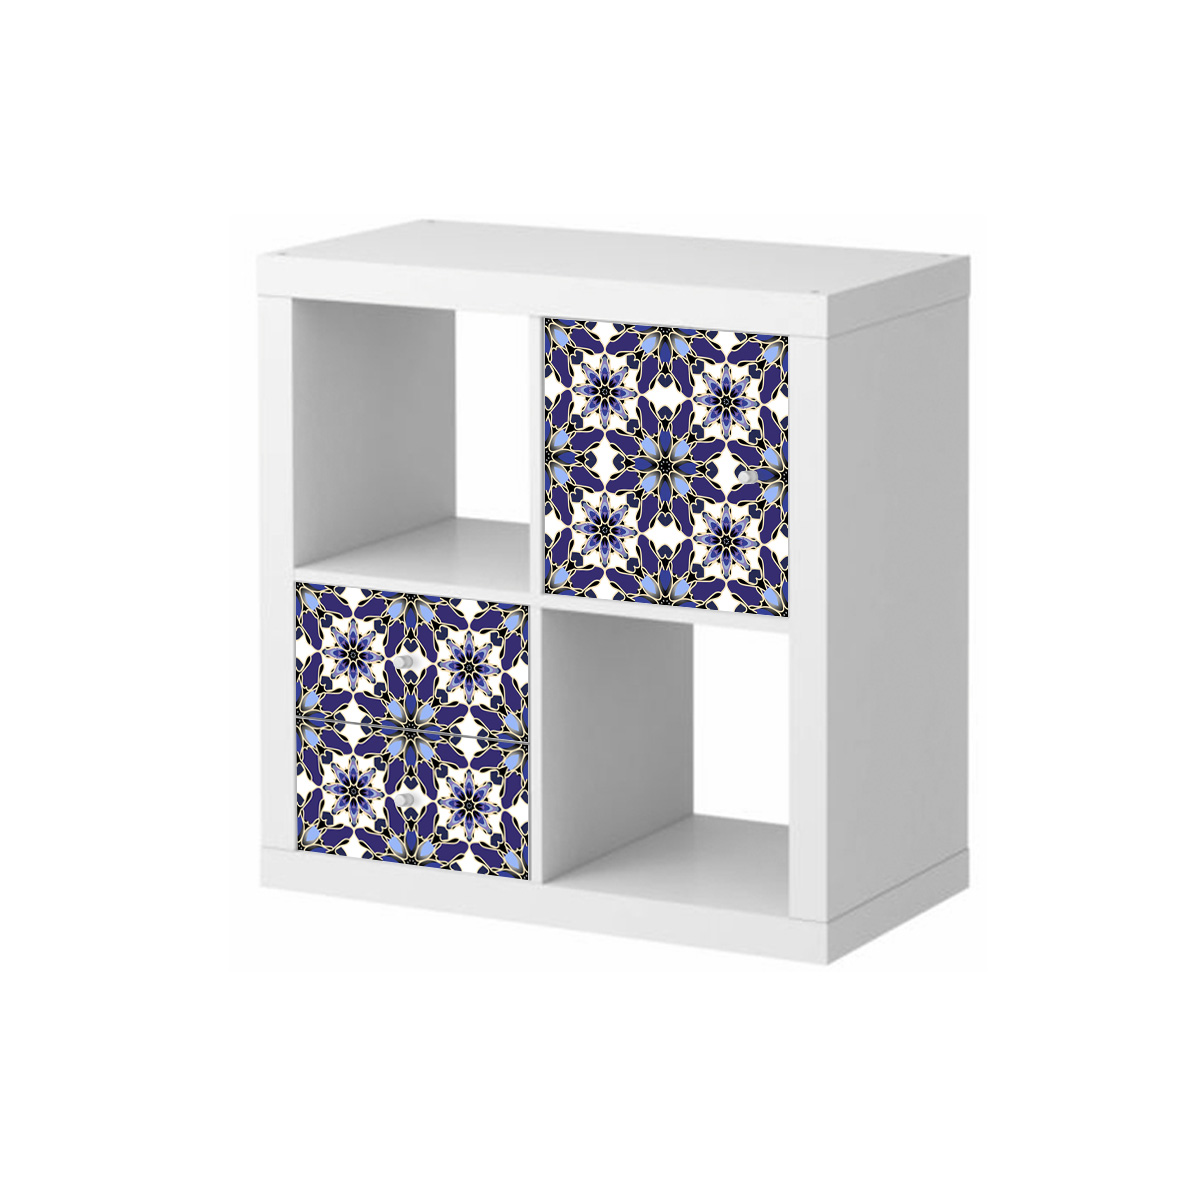 Stickers meubles ikea stickers meubles ikea vitrail en bleu ambiance - Ameublement ikea ...